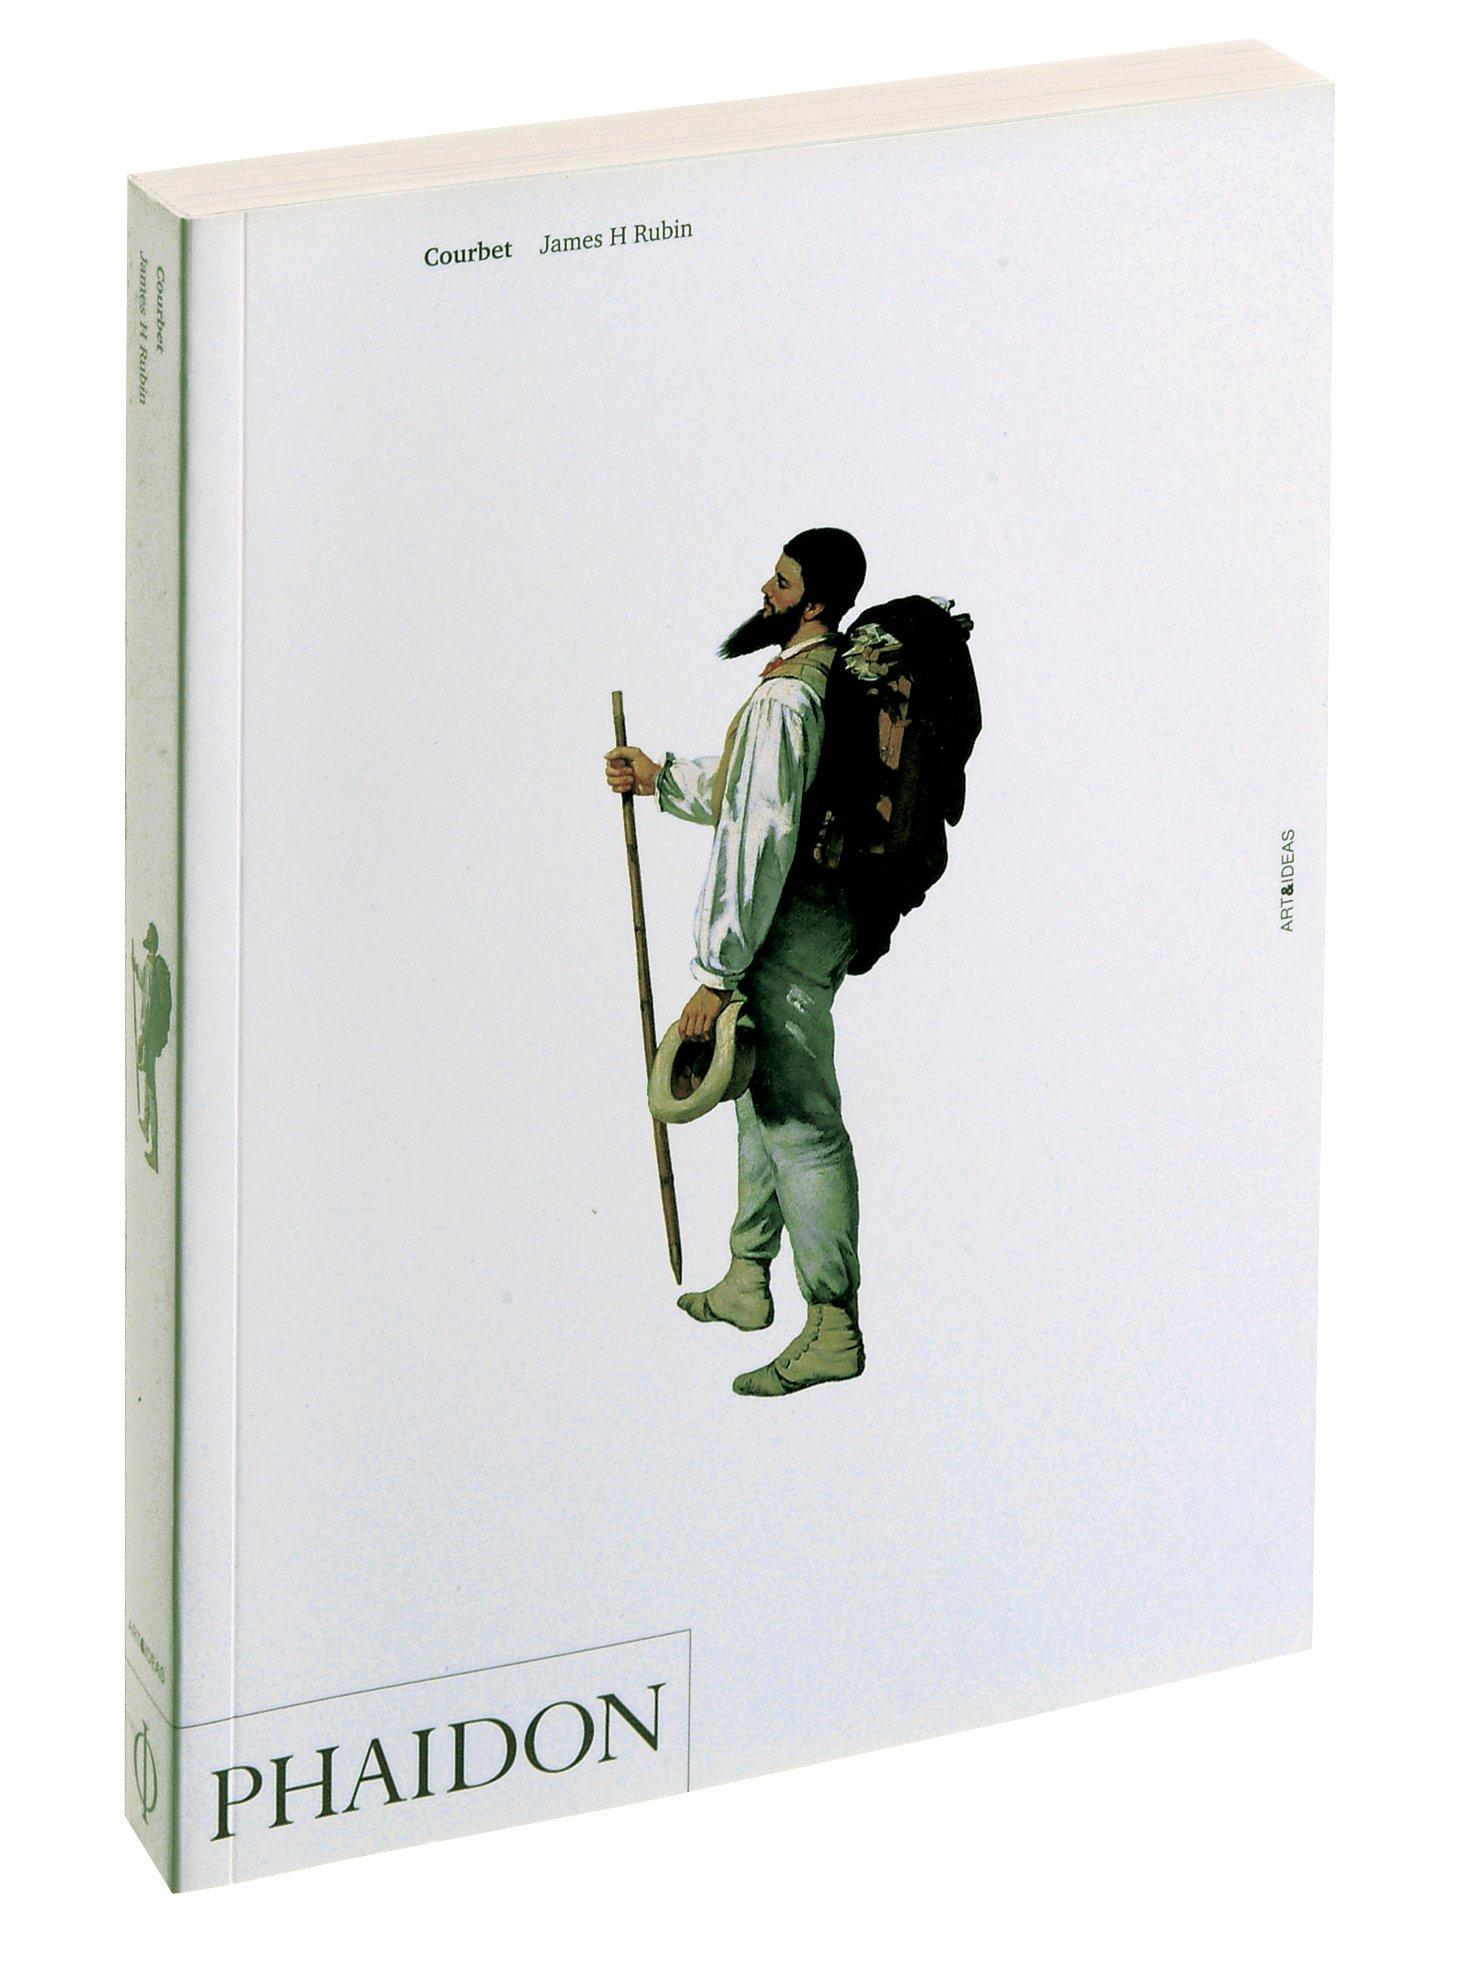 Courbet (Beaux-arts - Art & idées - promo): Amazon.es: James-Henry Rubin: Libros en idiomas extranjeros